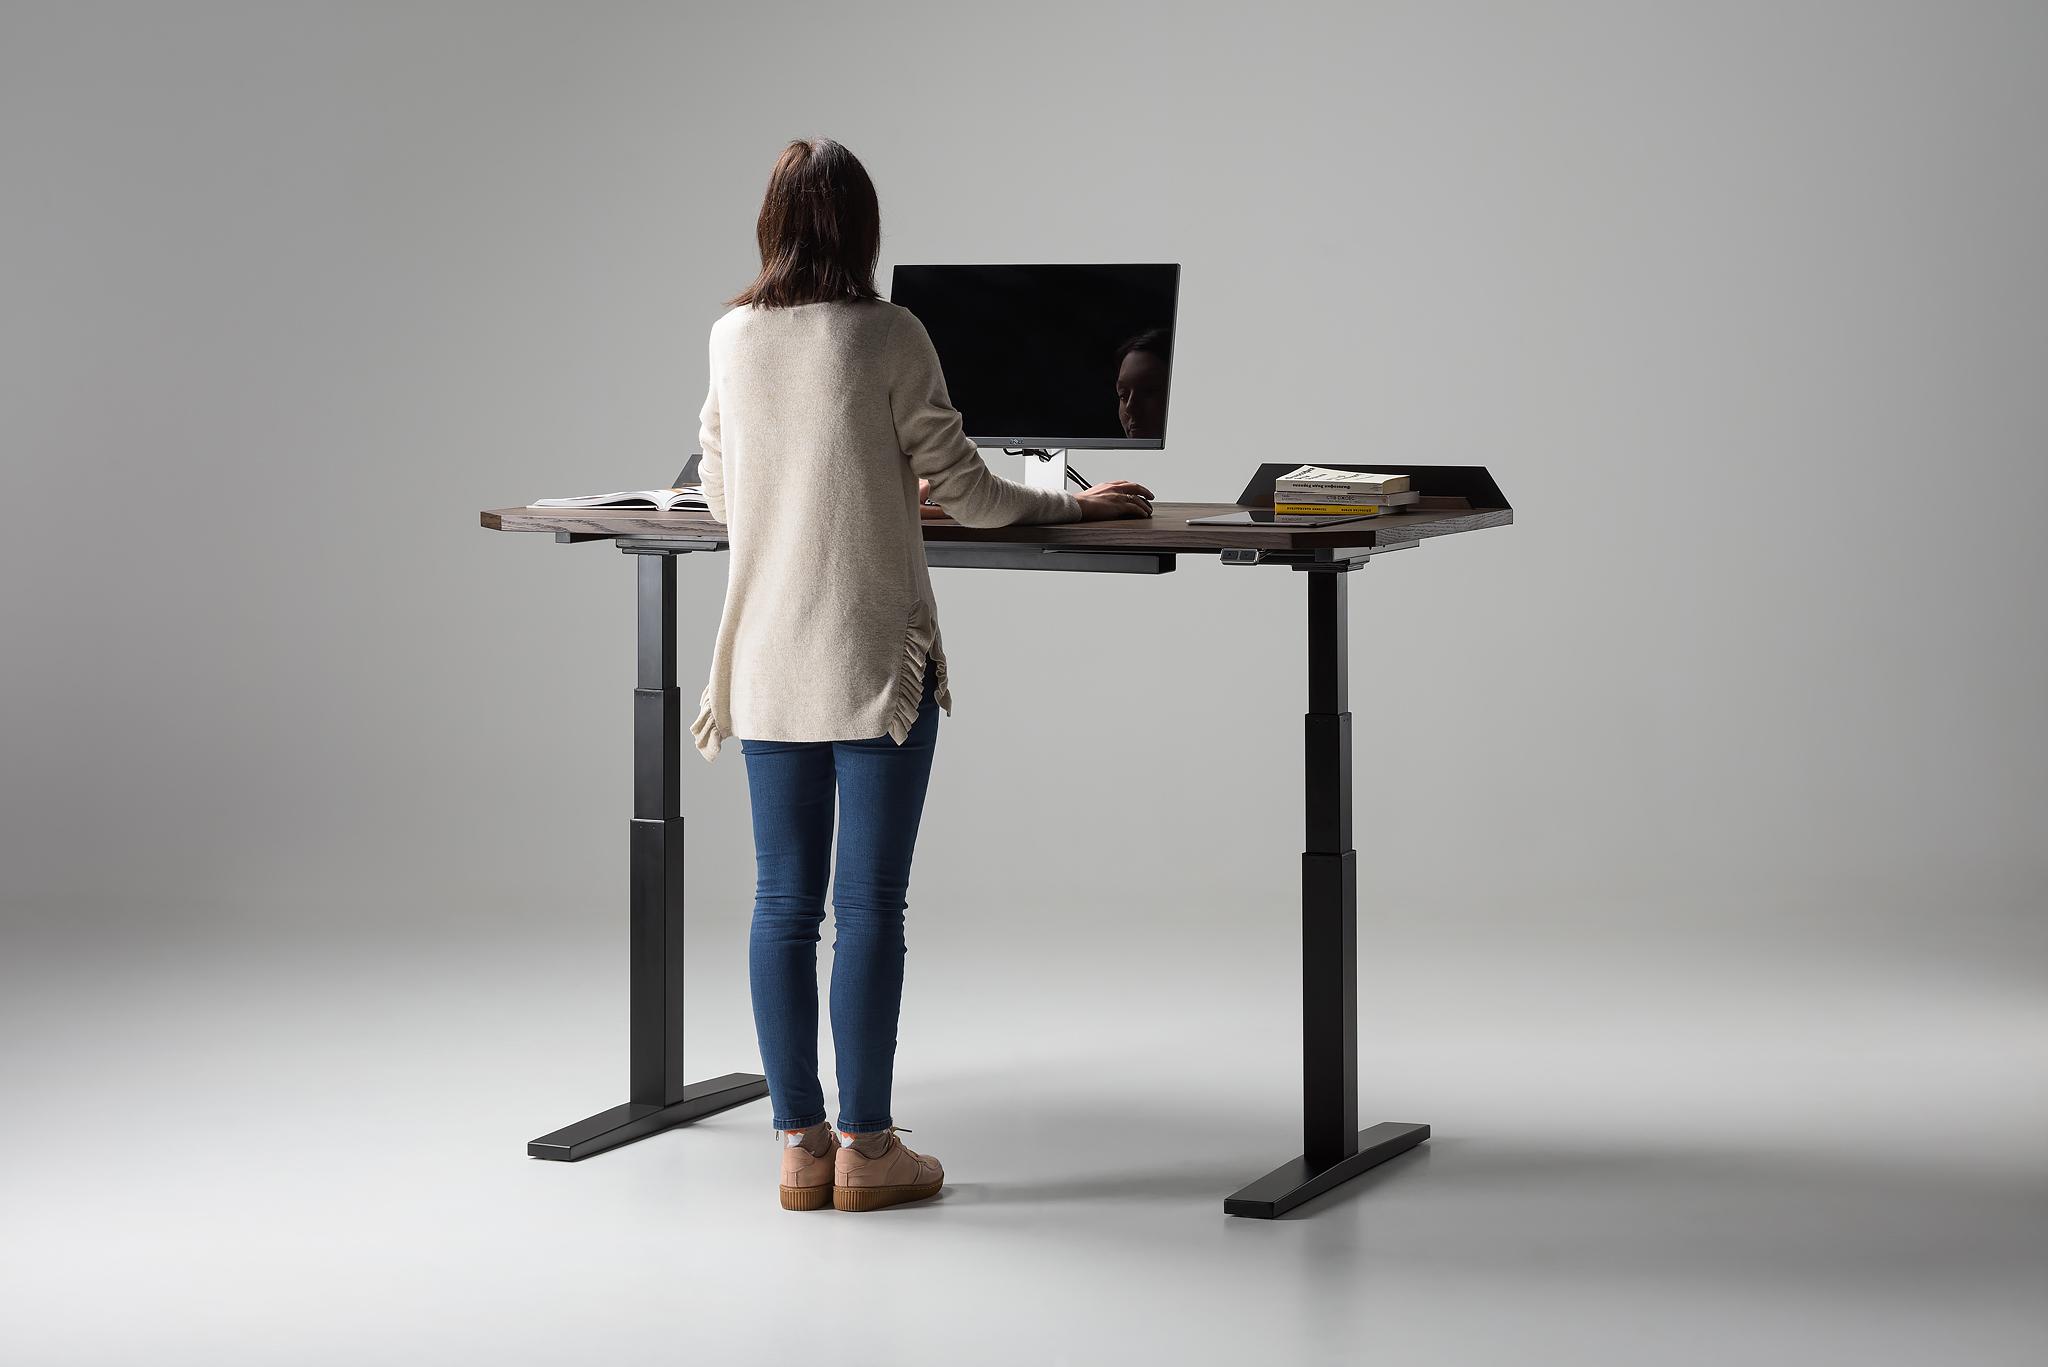 UFO_Lift_Desk (7)